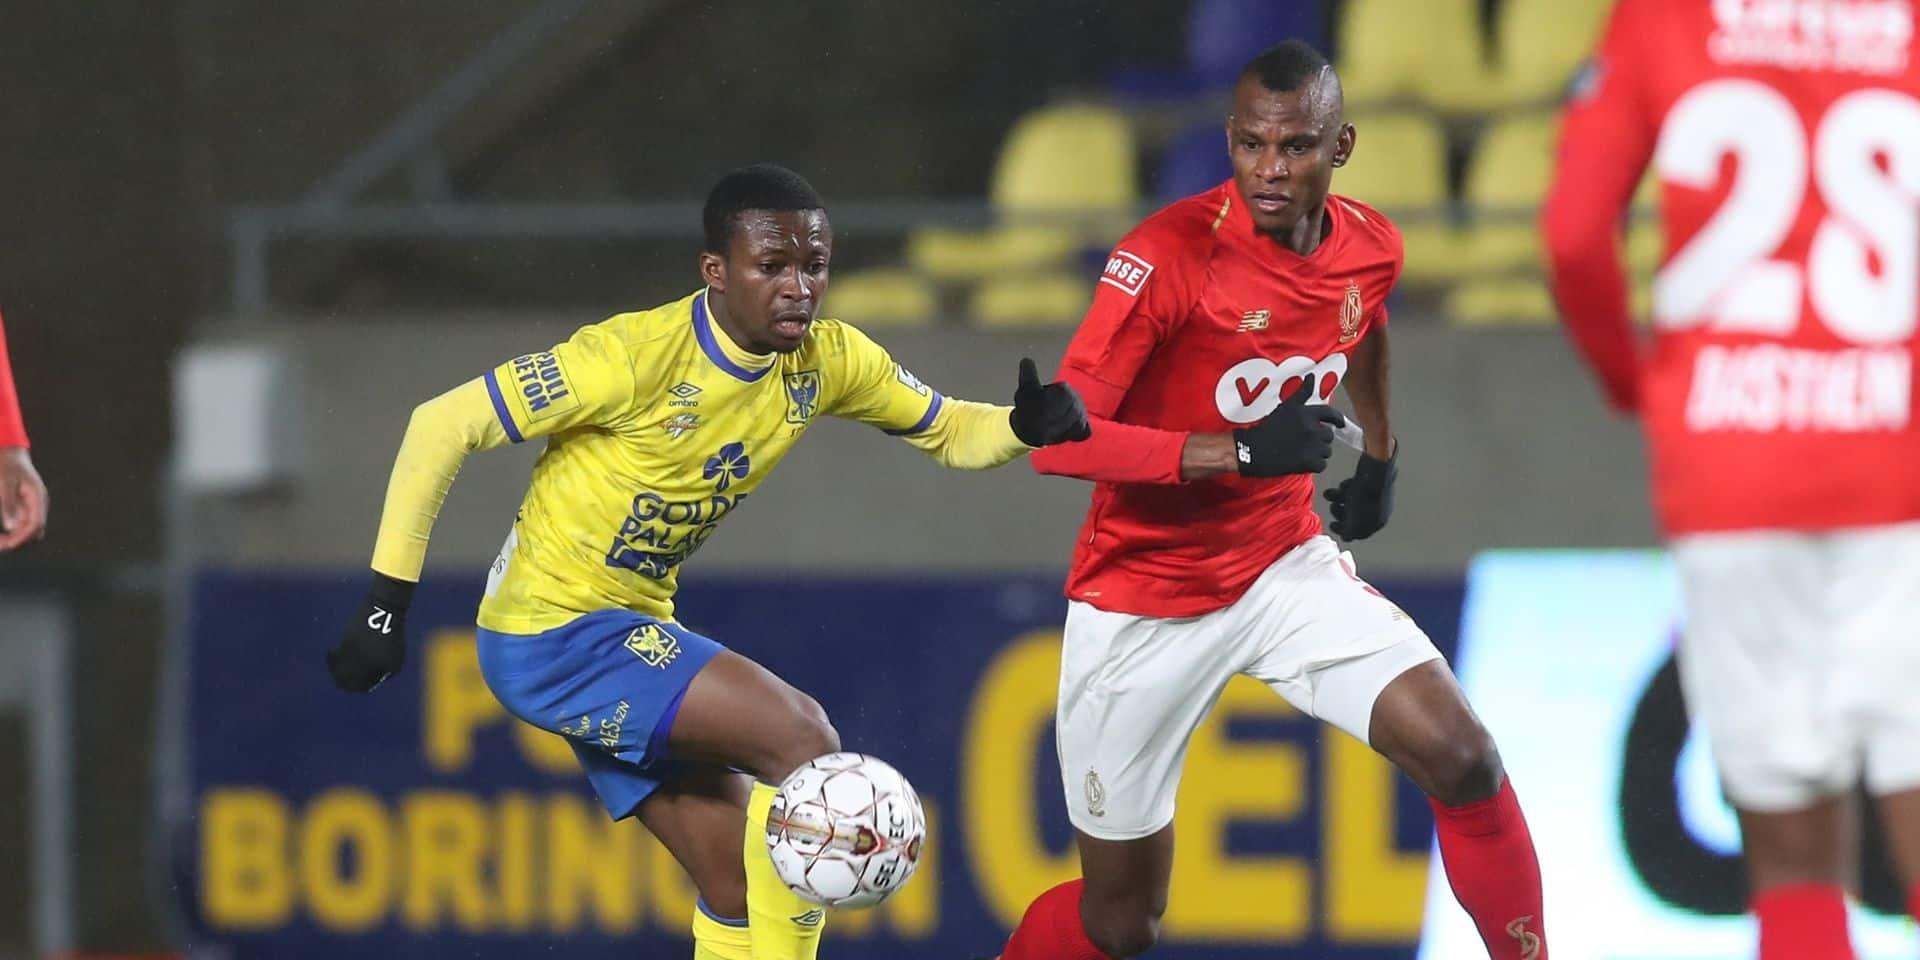 Uche Agbo vers un nouveau prêt au Deportivo La Corogne